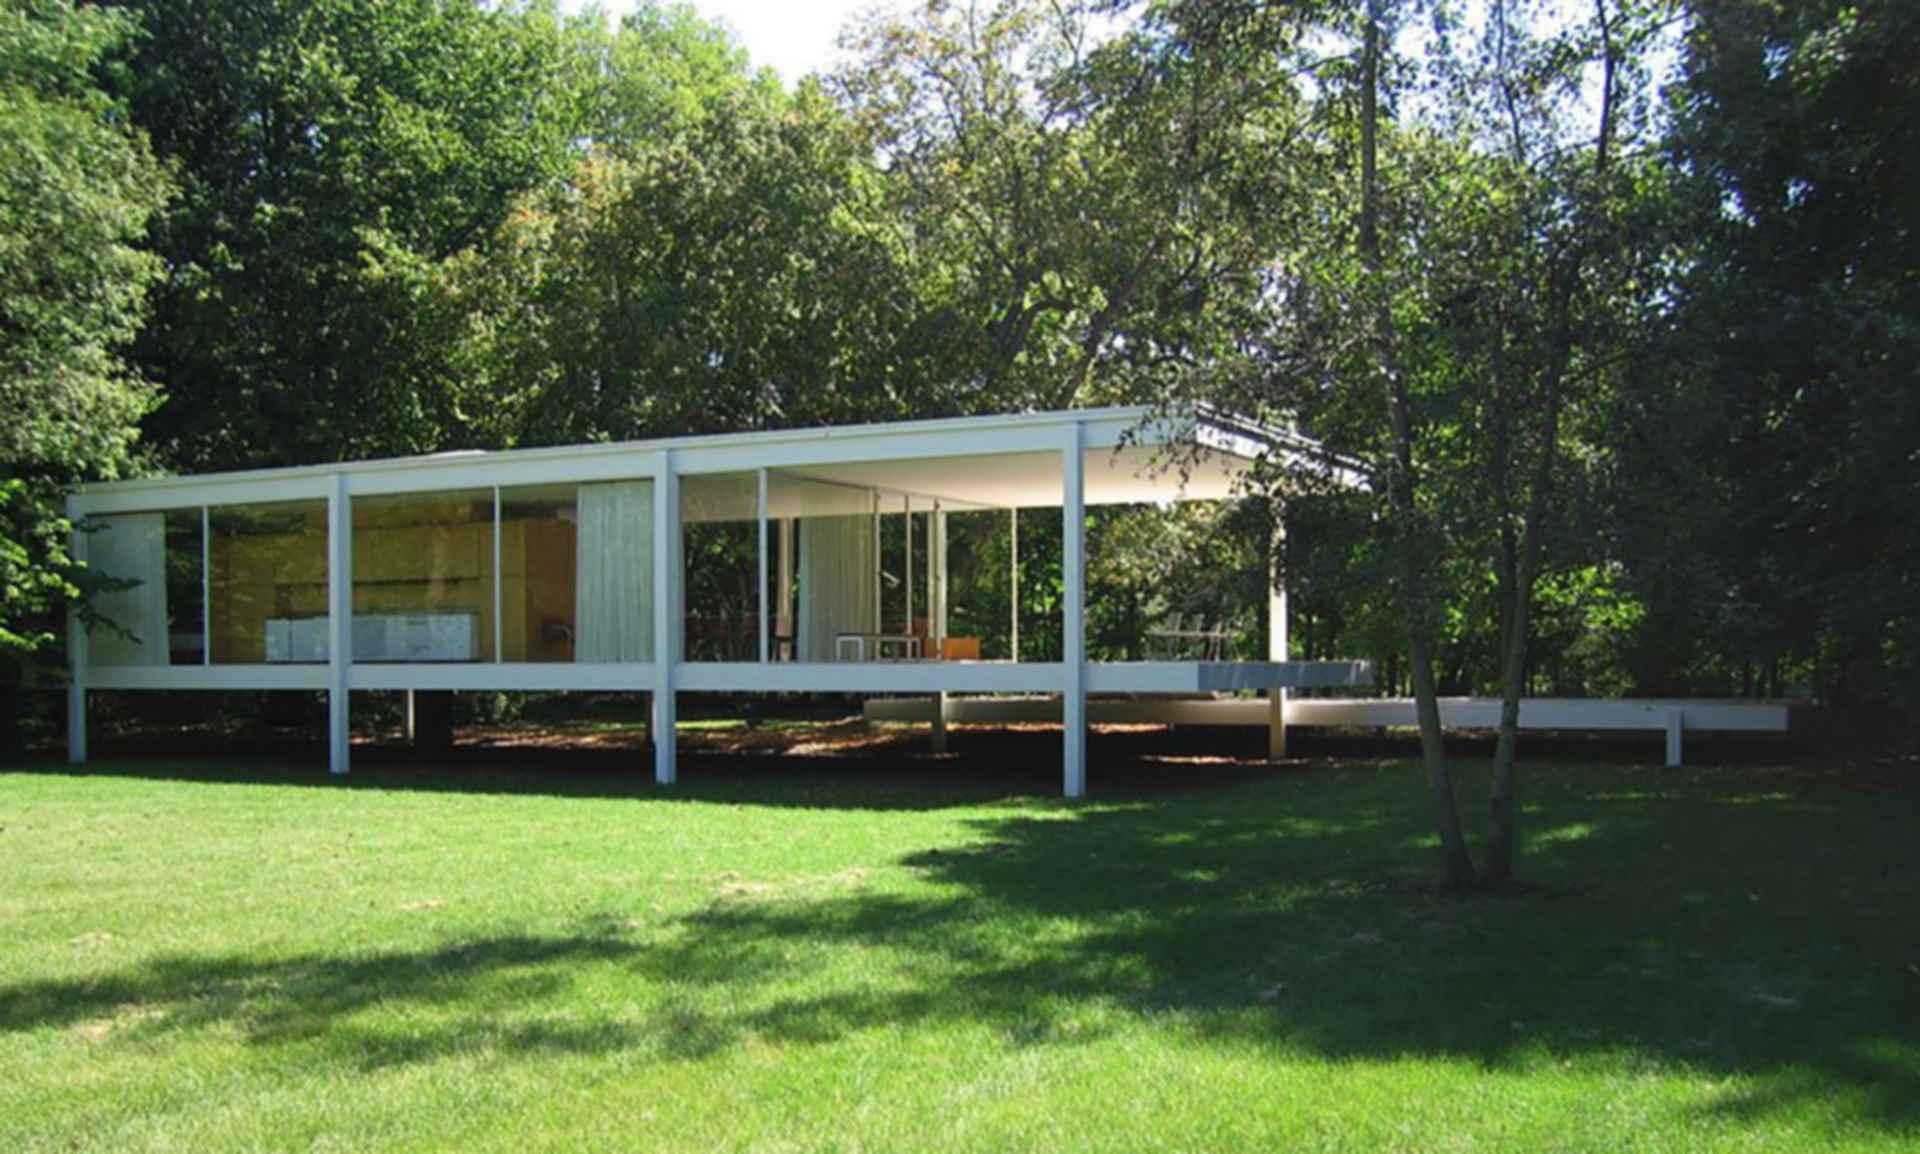 Farnsworth House - Exterior/Landscape